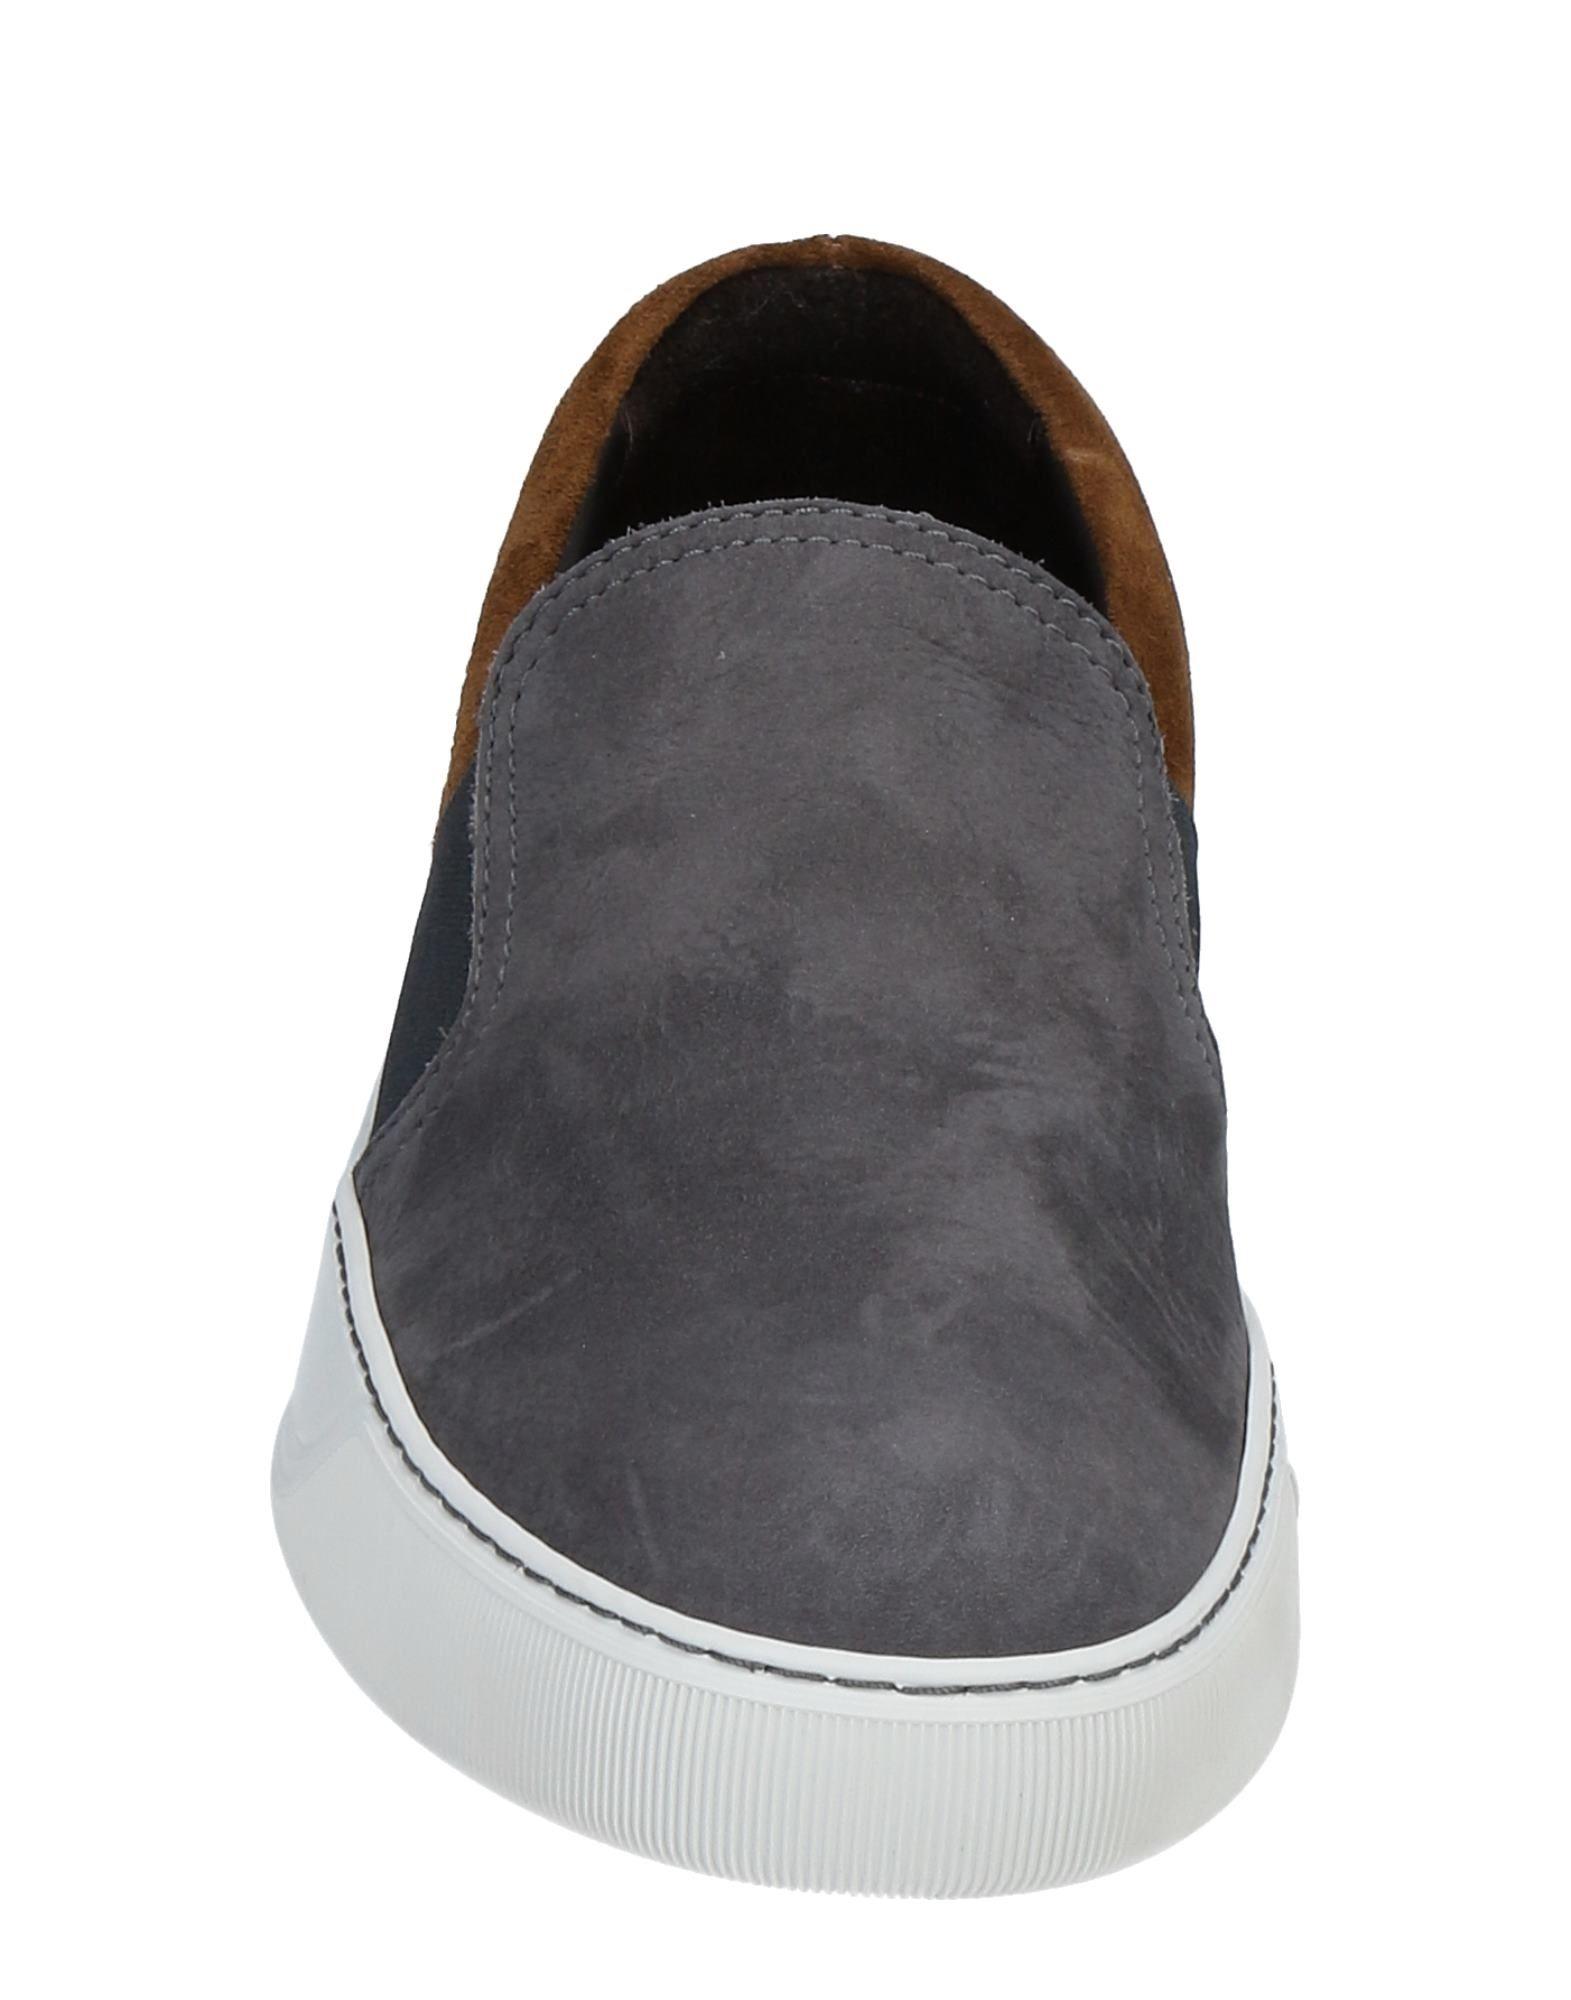 Lanvin Sneakers Herren  11514139LG 11514139LG   62e6f0